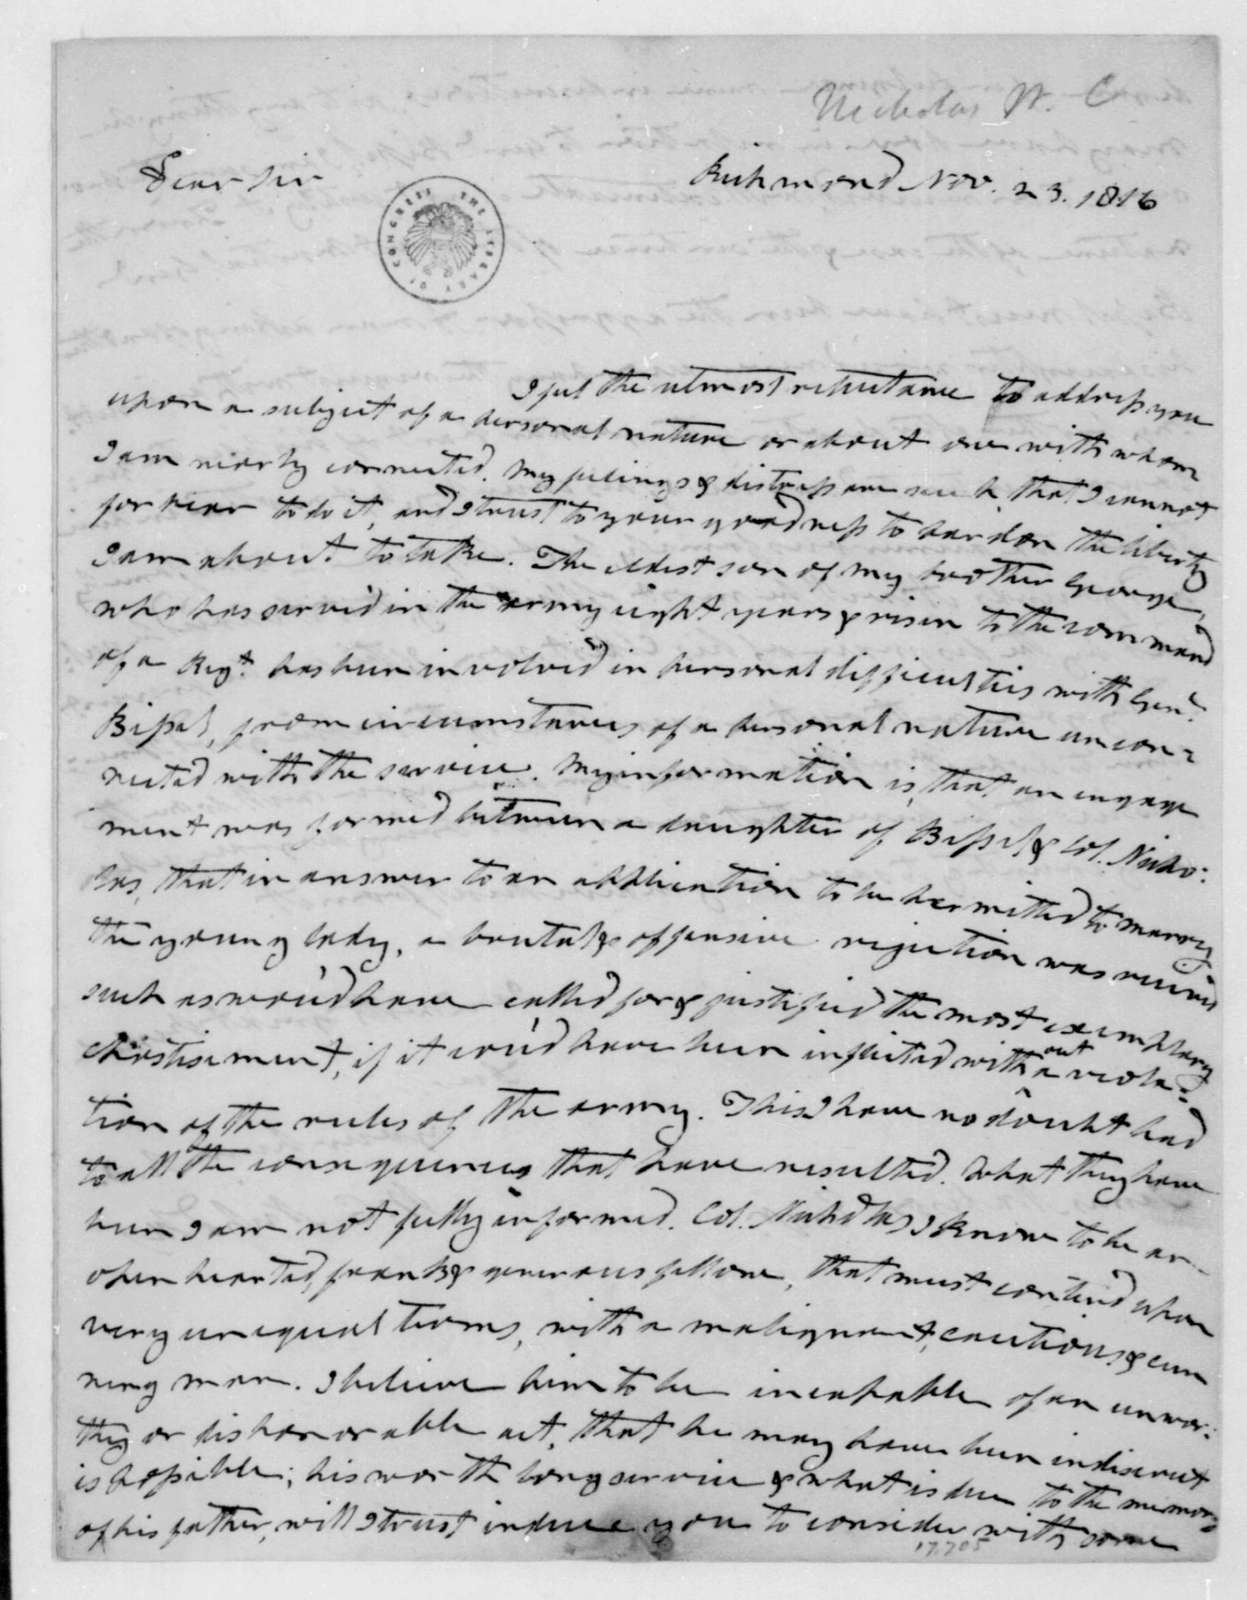 Wilson Cary Nicholas to James Madison, November 23, 1816.